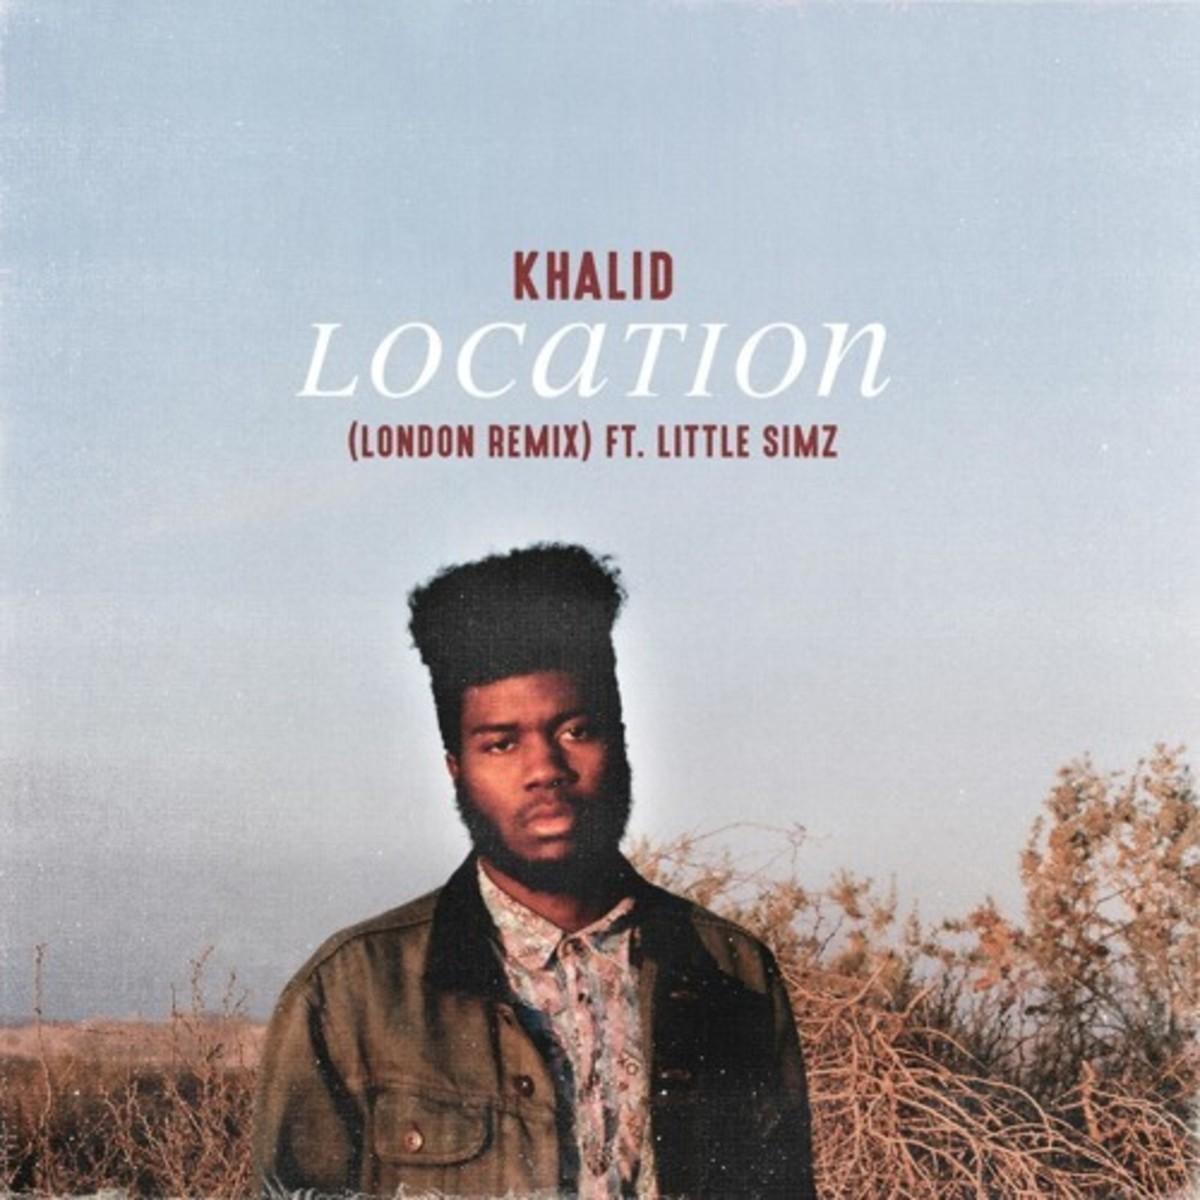 khalid-location-london-remix.jpg